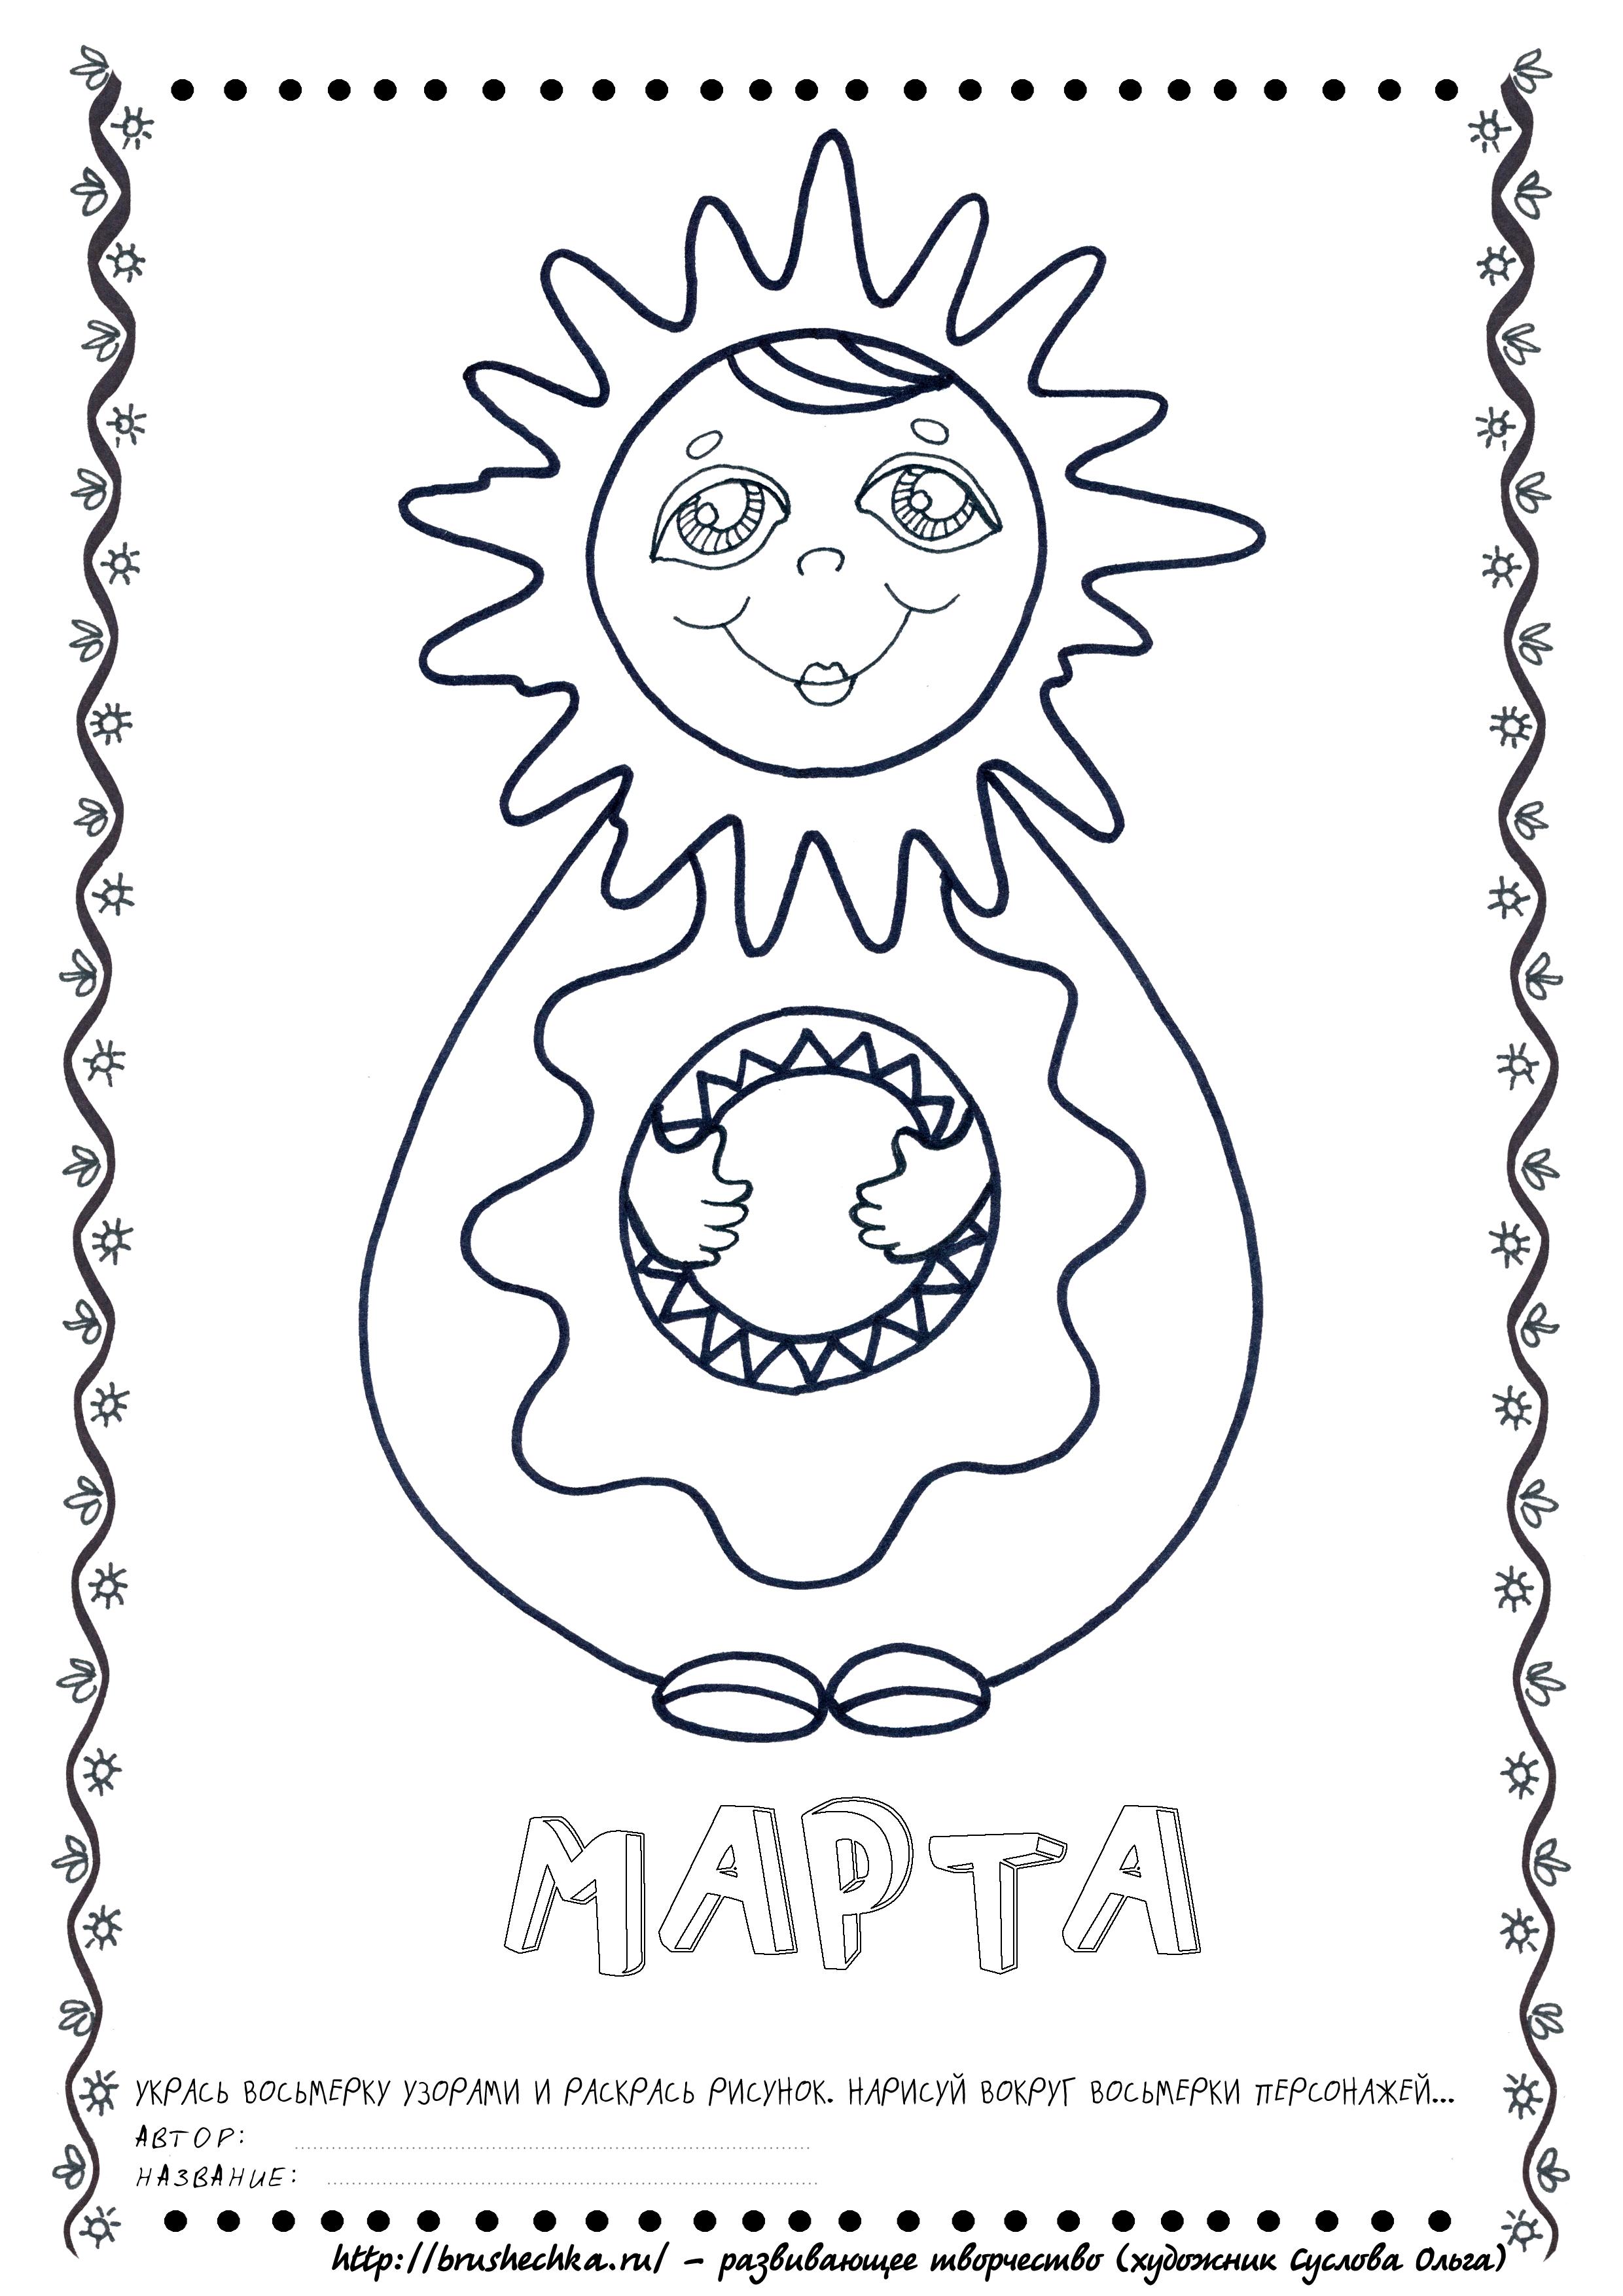 Матильда раскраска энгри бердз